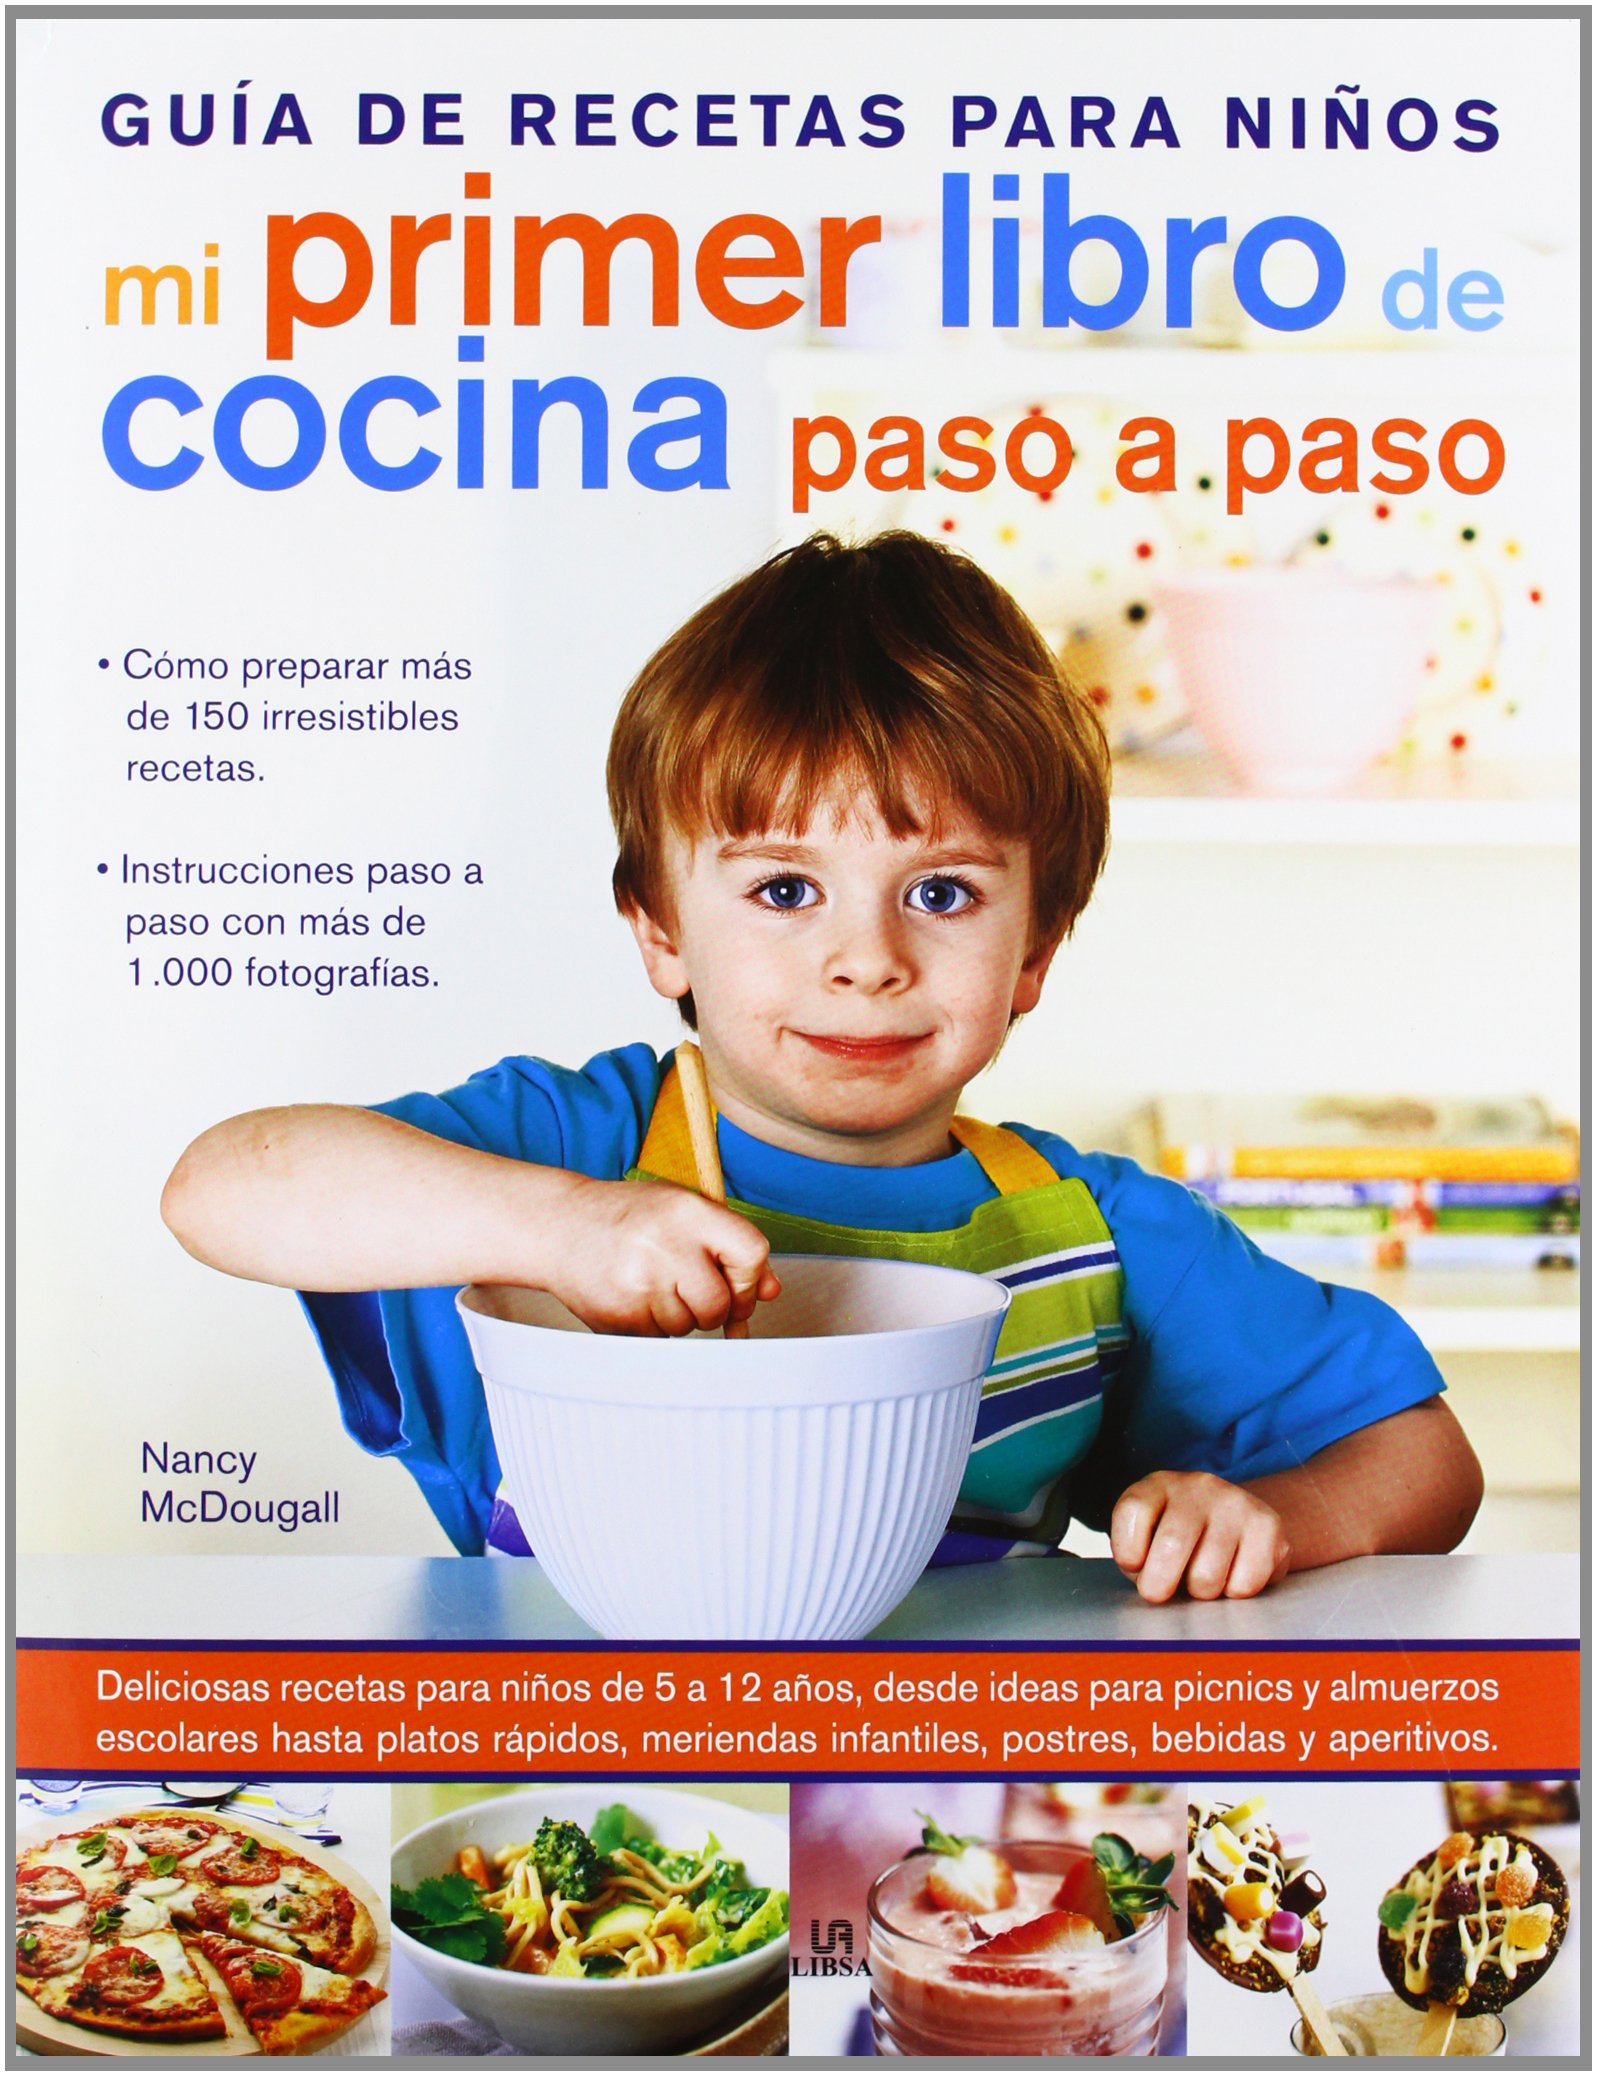 Mi Primer Libro De Cocina Paso A Paso Guia De Recetas Para Ninos